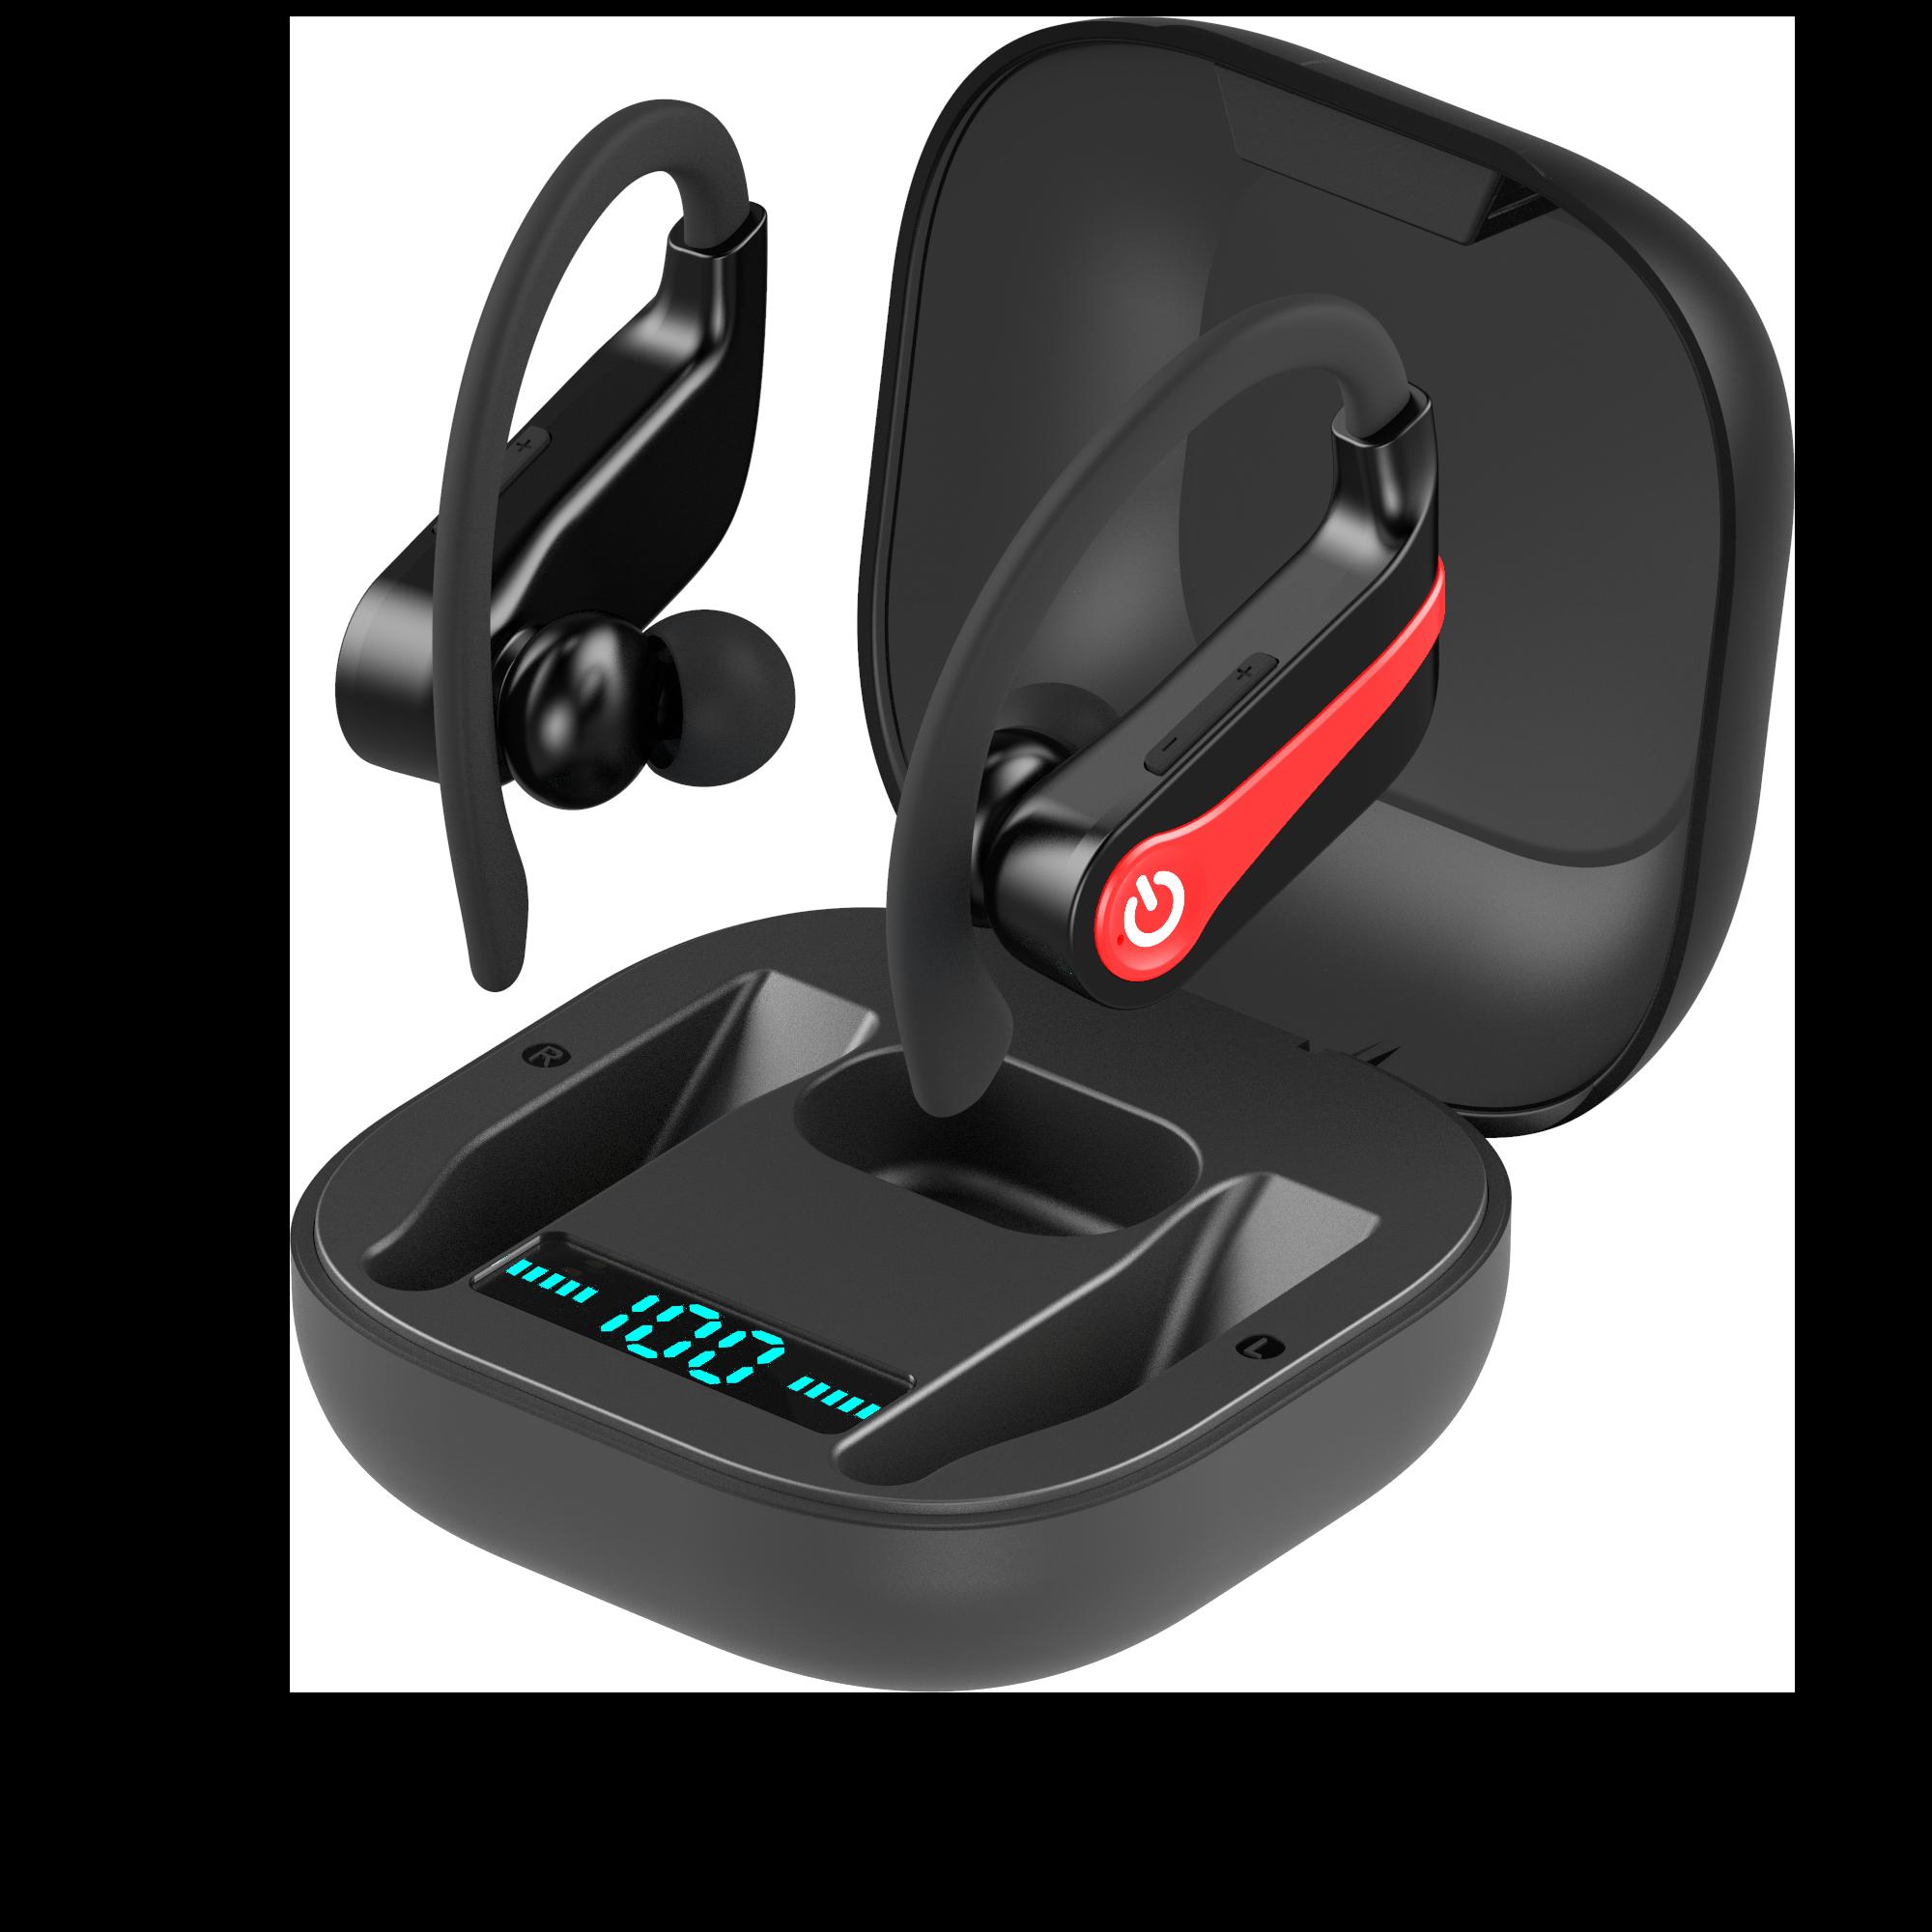 Mini Audifonos Con Bluetooth De 10 Horas Wireless Bluetooth Earphones With Mic And Hook - idealBuds Earphone | idealBuds.net